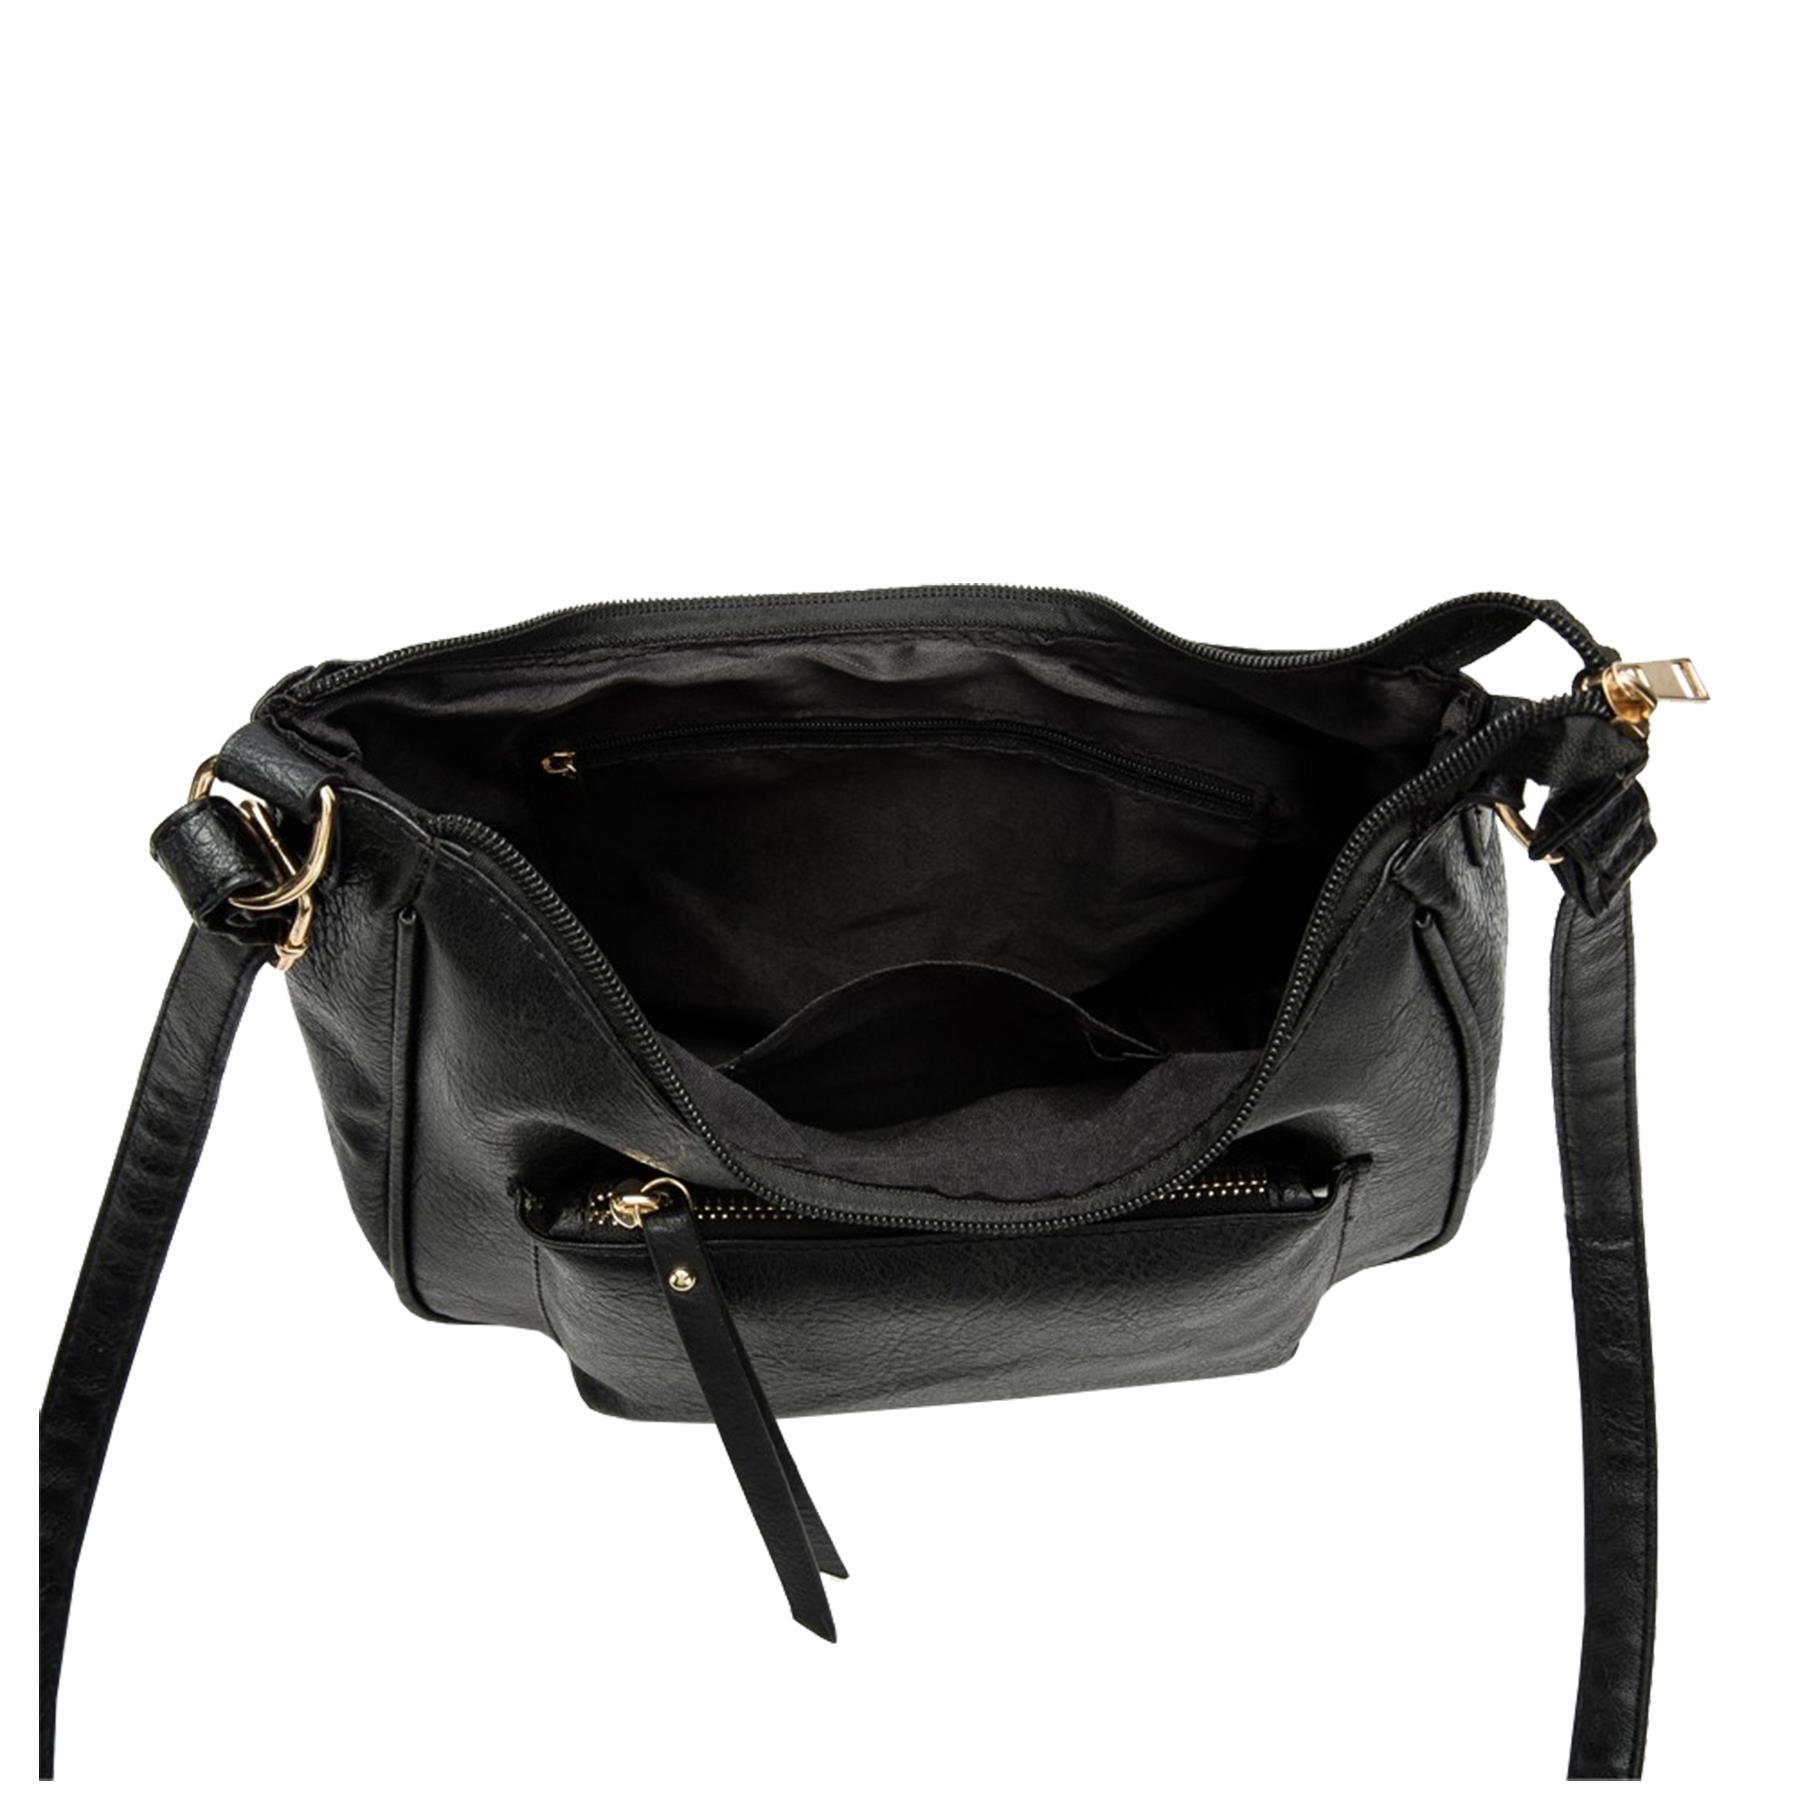 New-Soft-Synthetic-Leather-Front-Pocket-Ladies-Casual-Crossbody-Bag-Handbag thumbnail 7